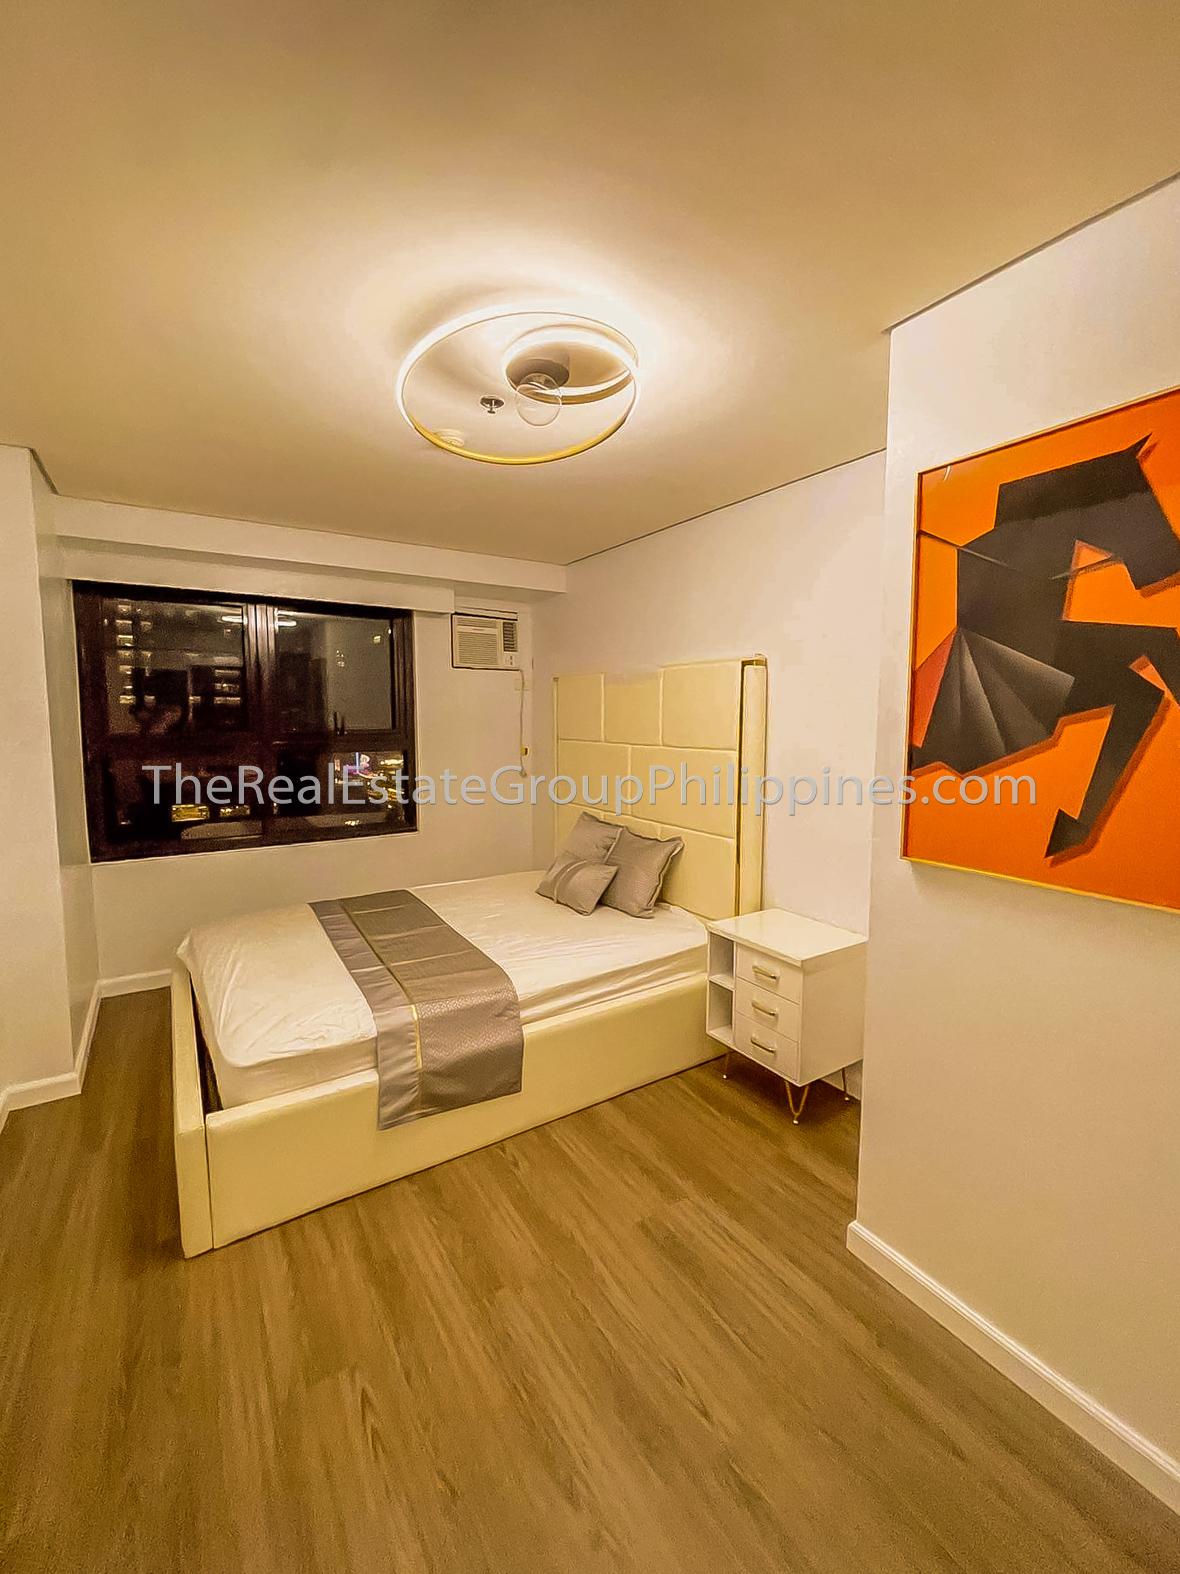 3 Bedroom Condominium For Sale BGC, Three Bedroom Condo For Sale Fort Residences, 3 BR Condo For Sale BGC Taguig, 3BR Condo For Sale Burgos Circle BGC6